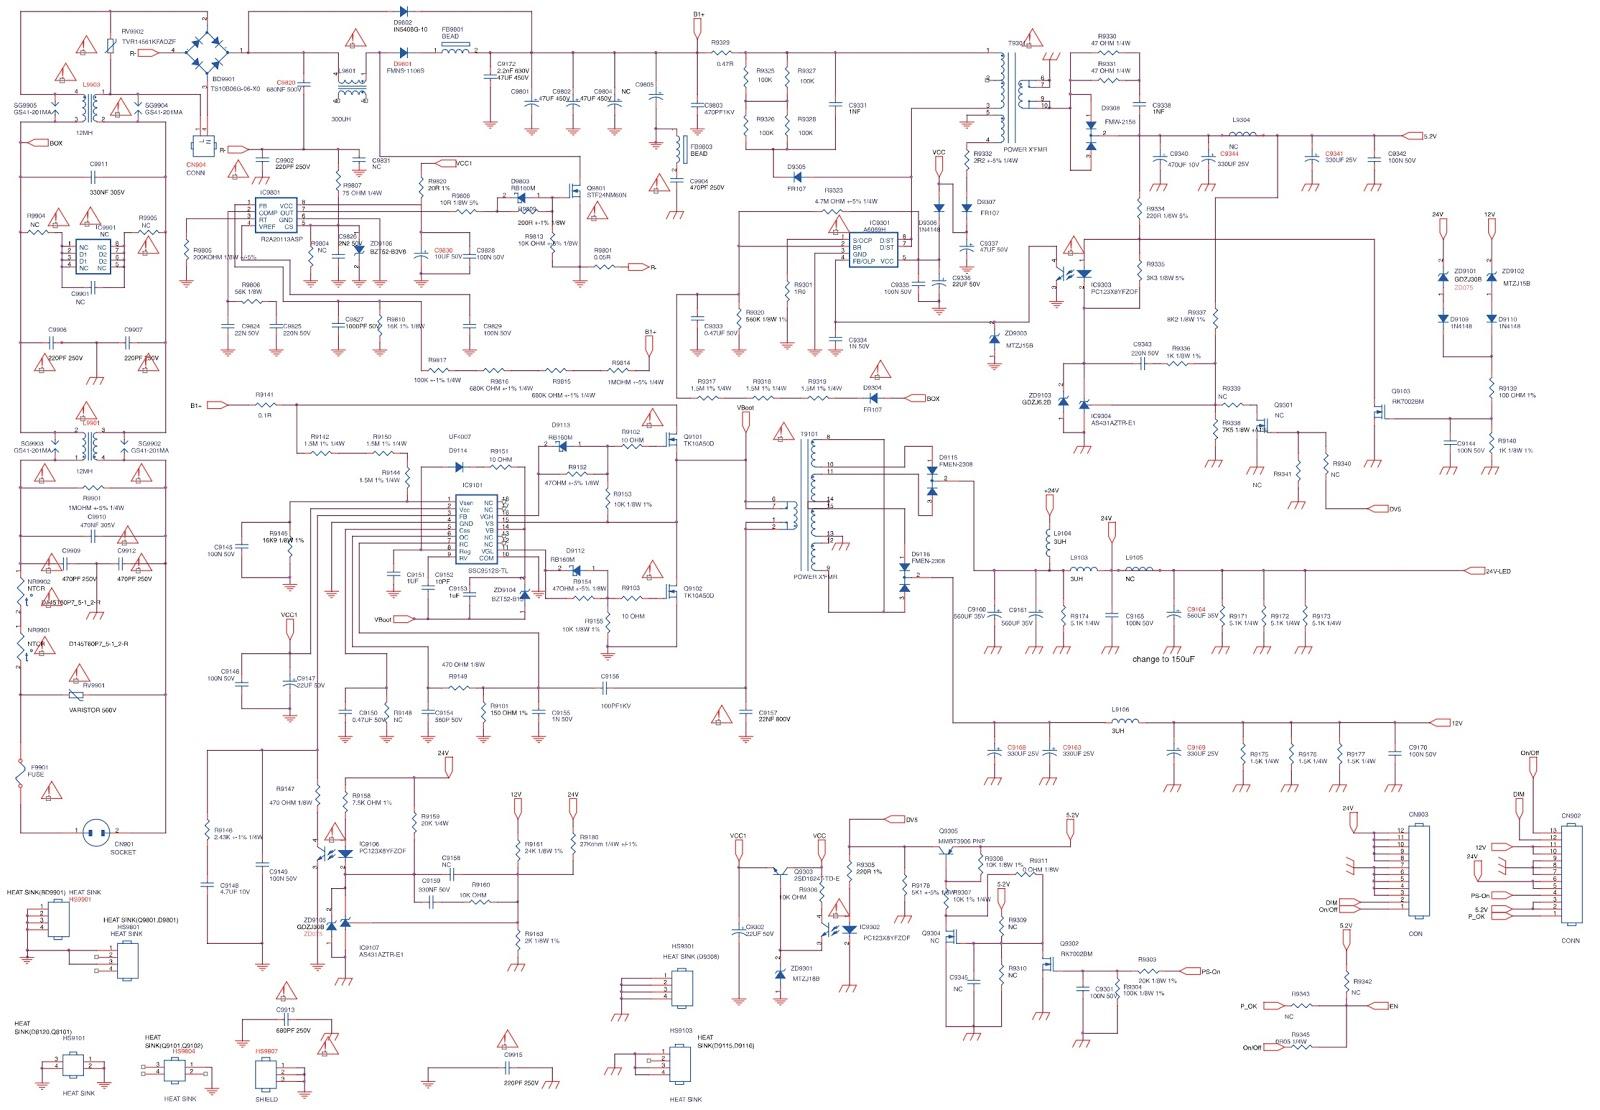 Master Electronics Repair !: 715G5243, 715G5173, 715G5113 POWER